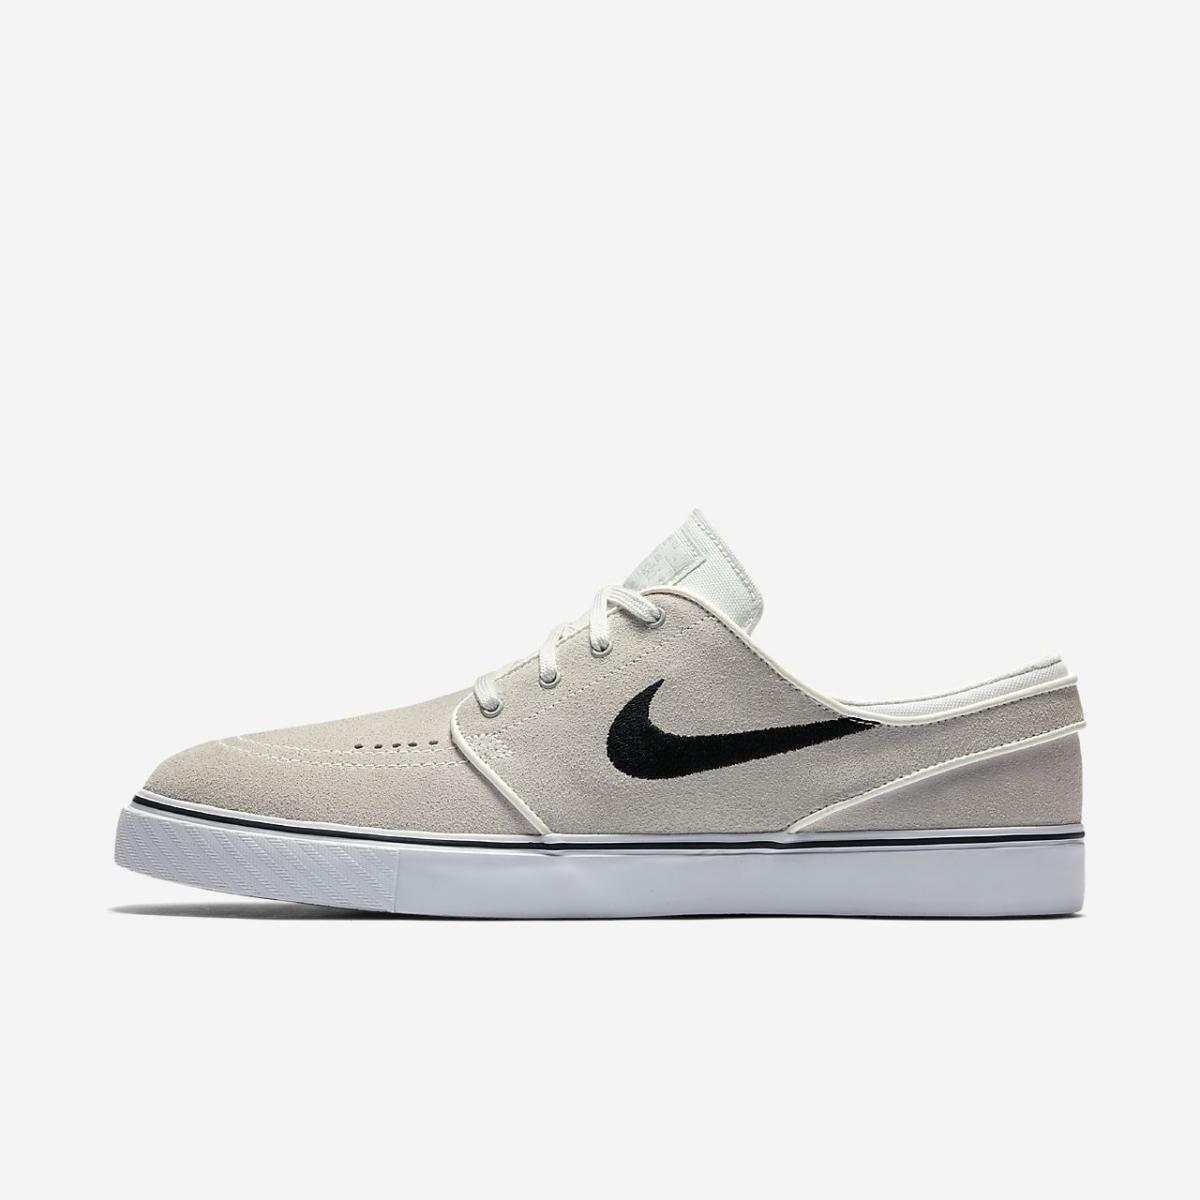 Nike SB Zoom Stefan Janoski Summit White Black 333824 108 New Men's Skate Shoes